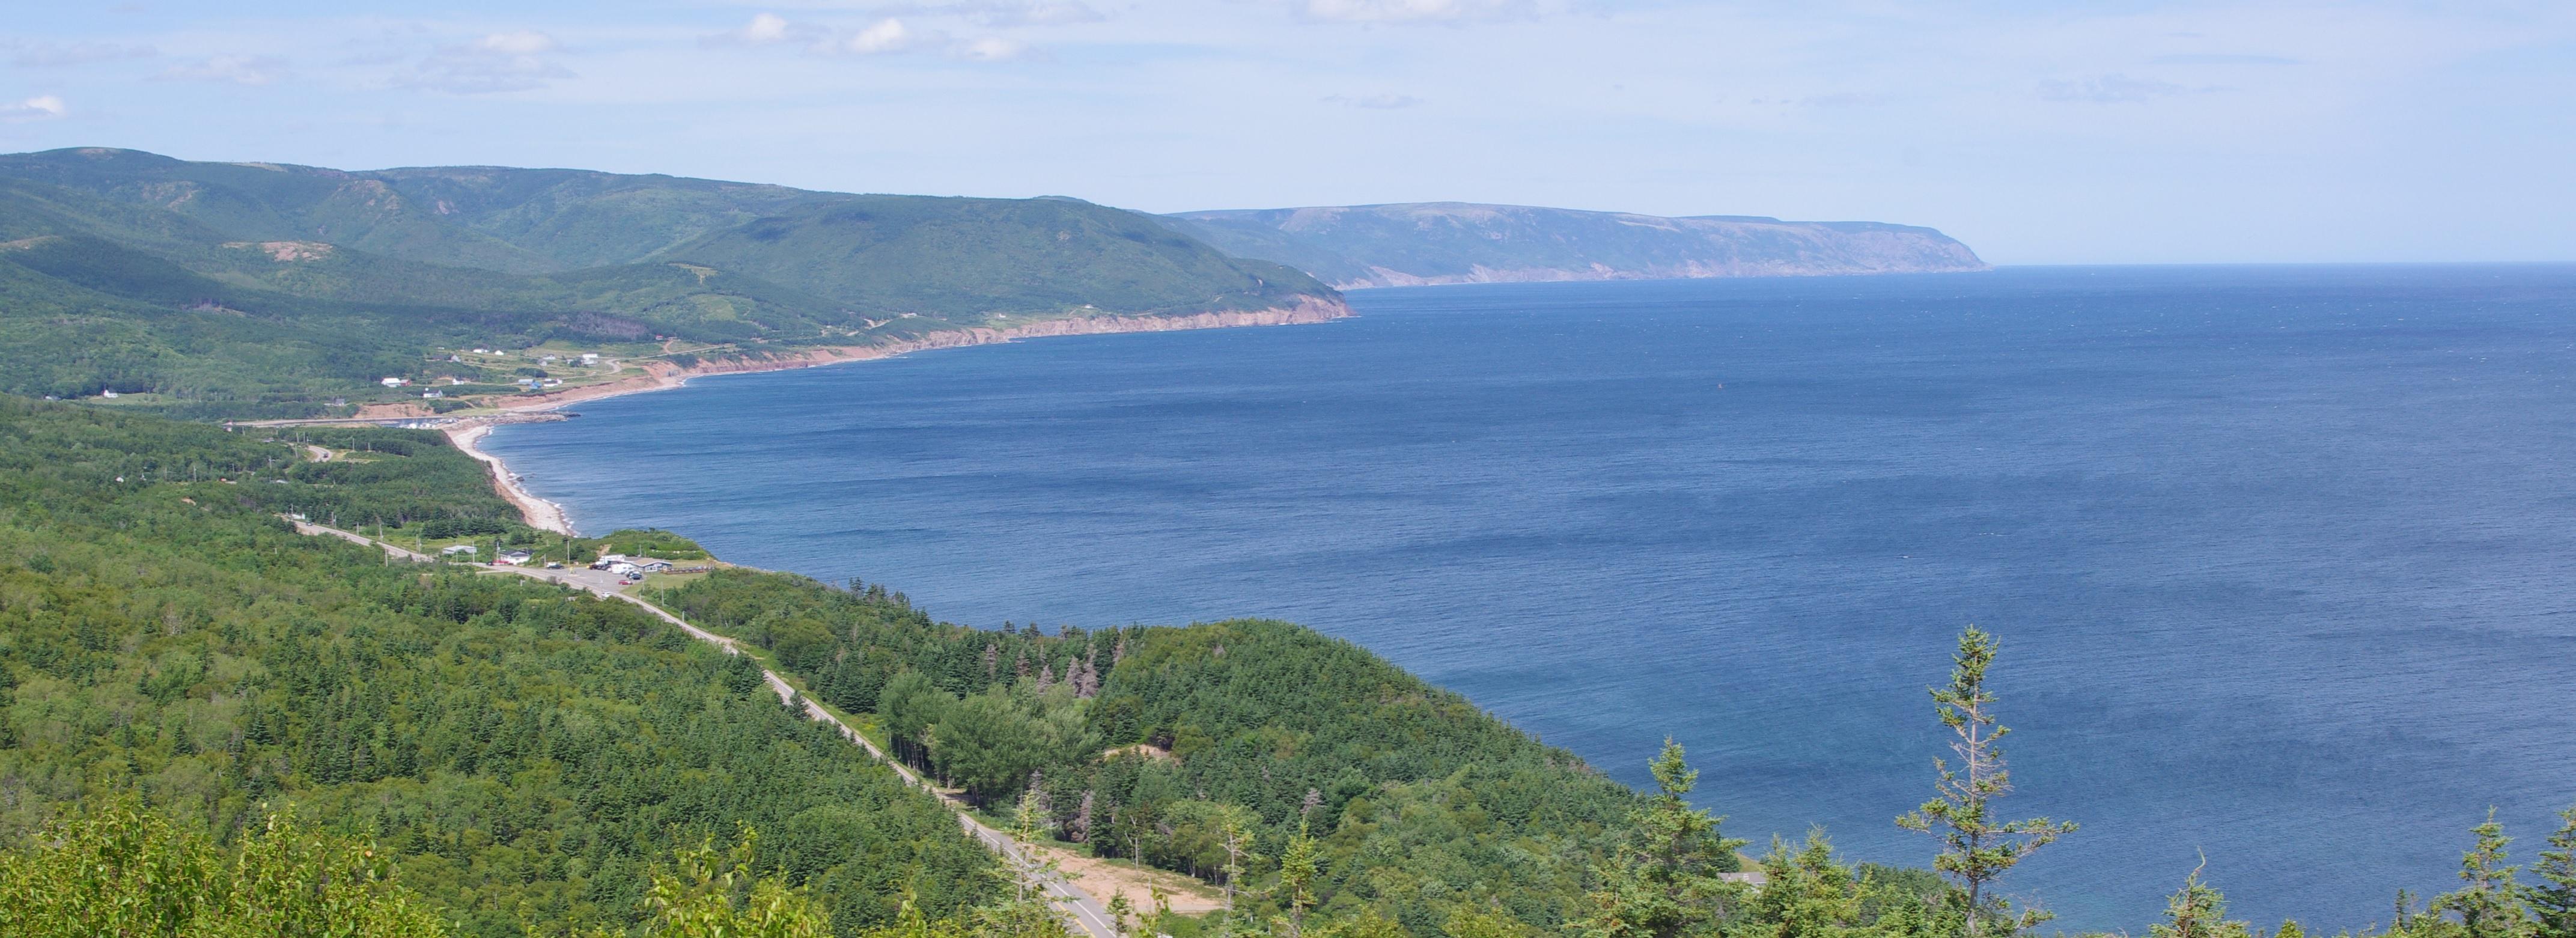 Cabot Trail - Cape Breton Island